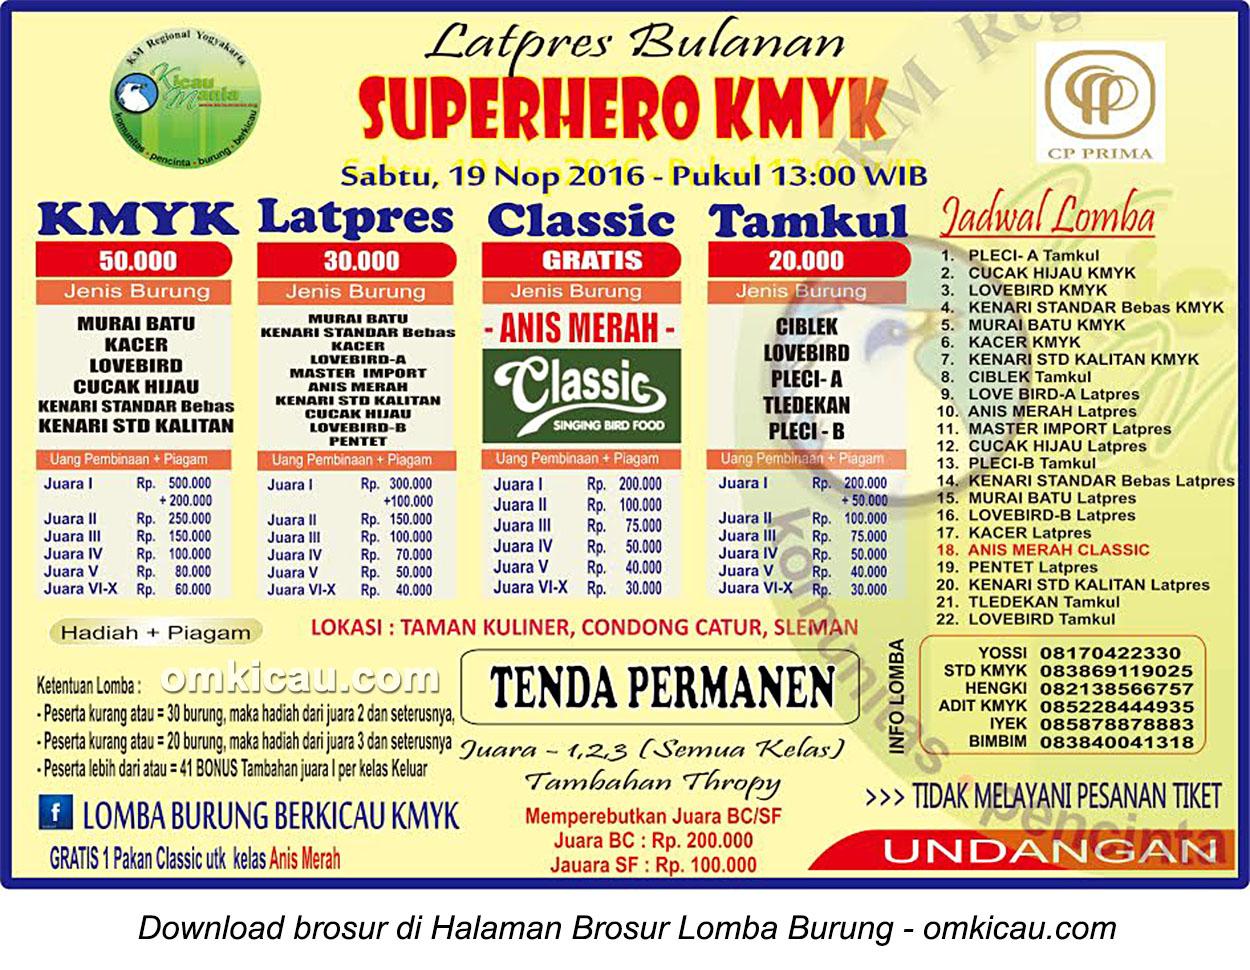 Brosur Latpres Bulanan Superhero KMYK, Jogja, 19 November 2016